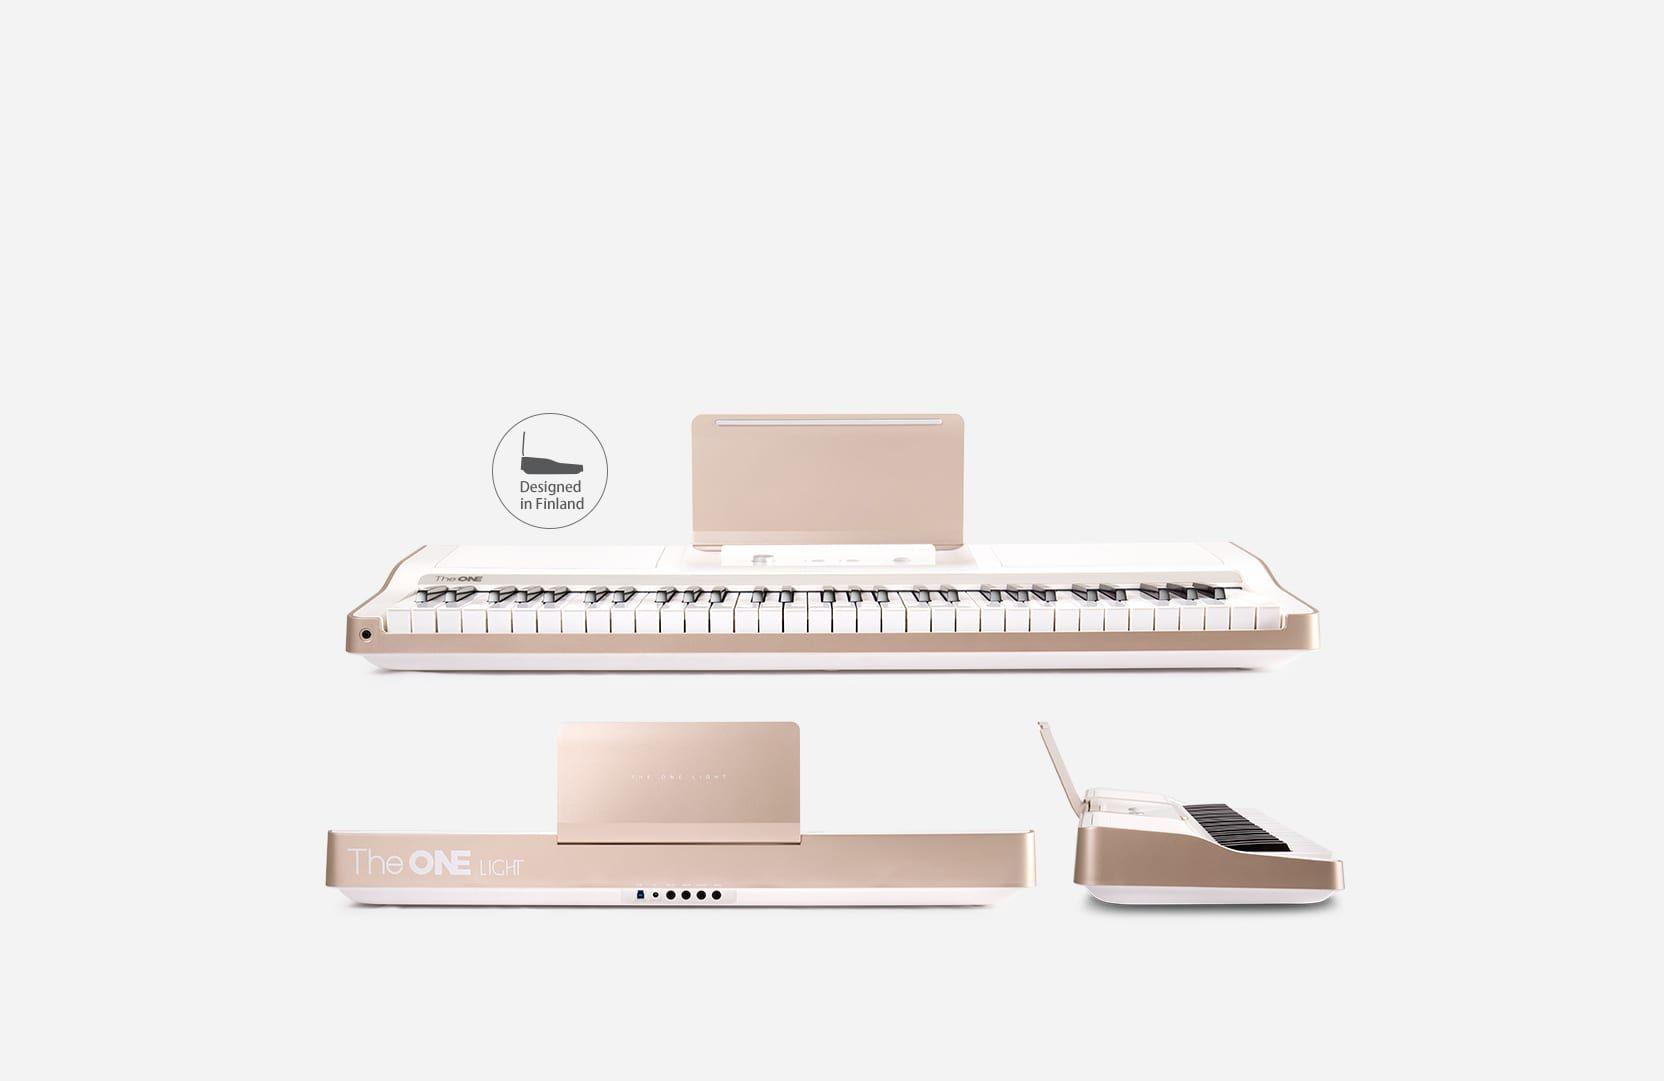 light keyboard key and lights